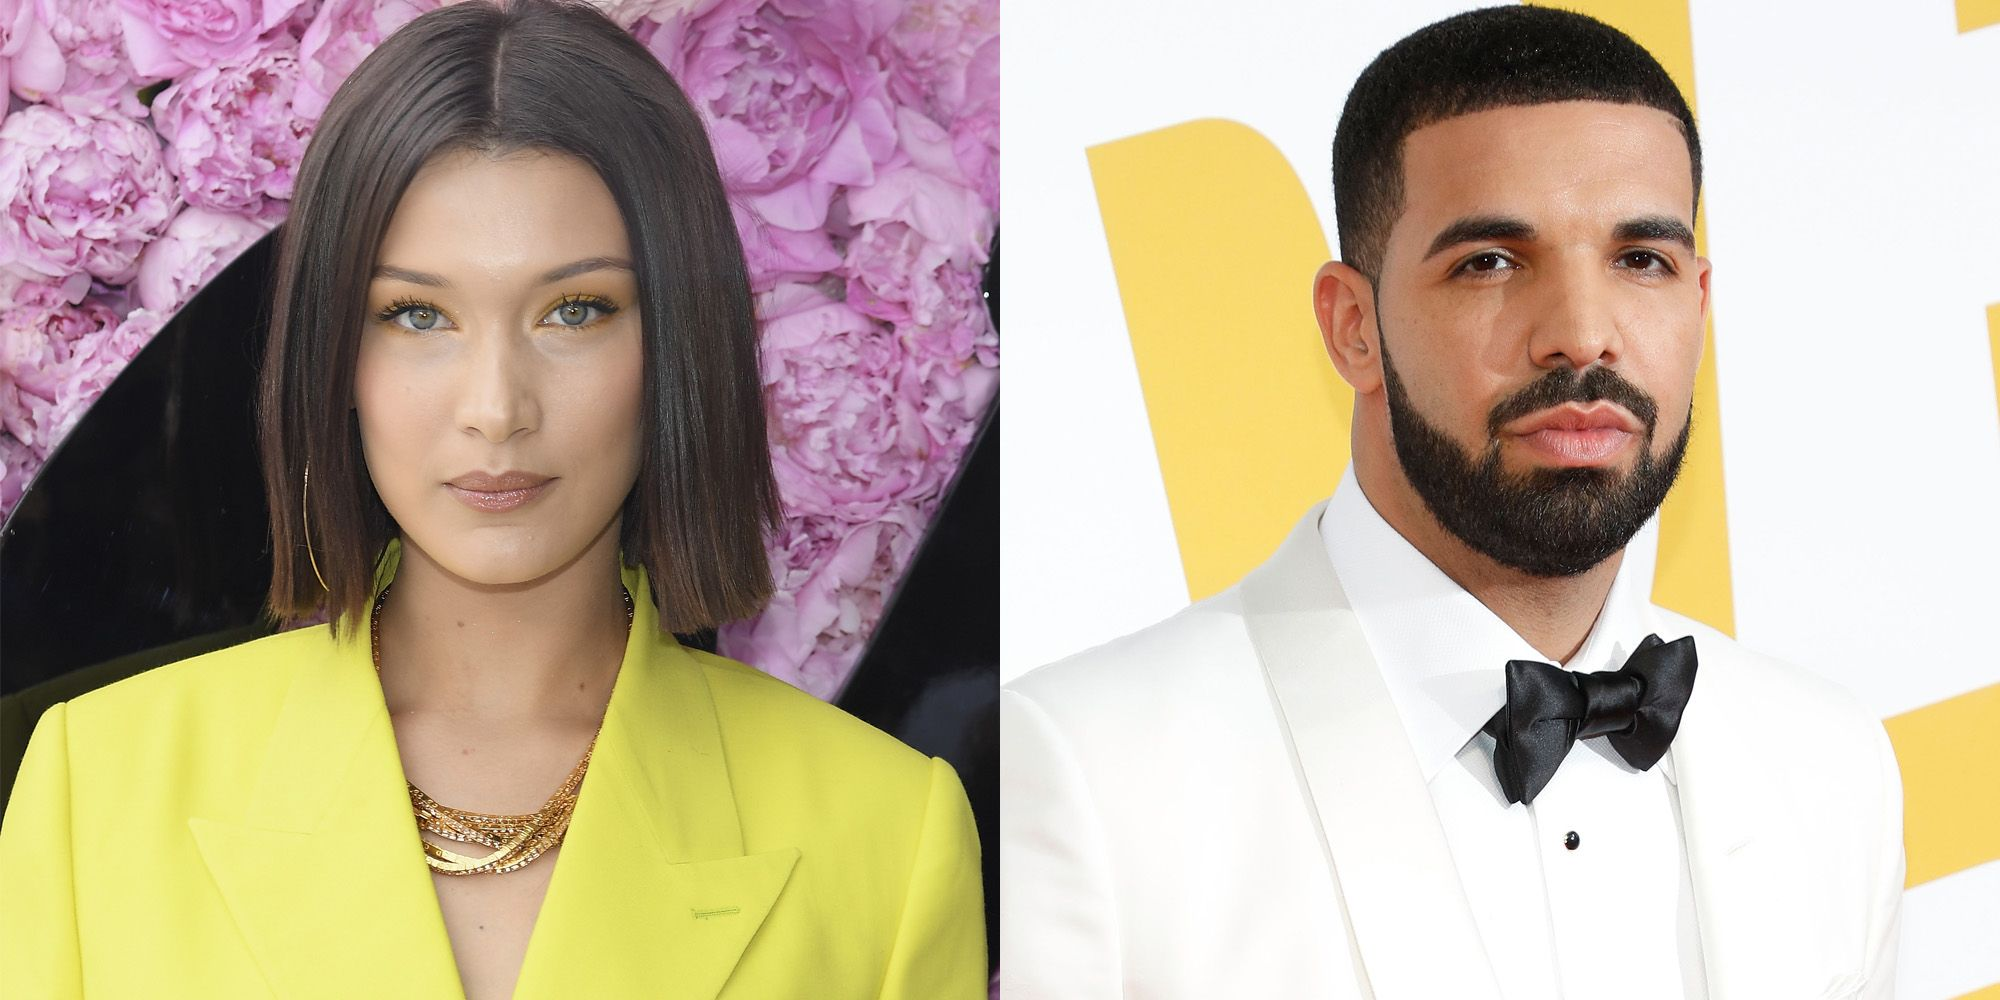 Drake's 'Scorpion' Lyrics Confirm That He Dated Bella Hadid